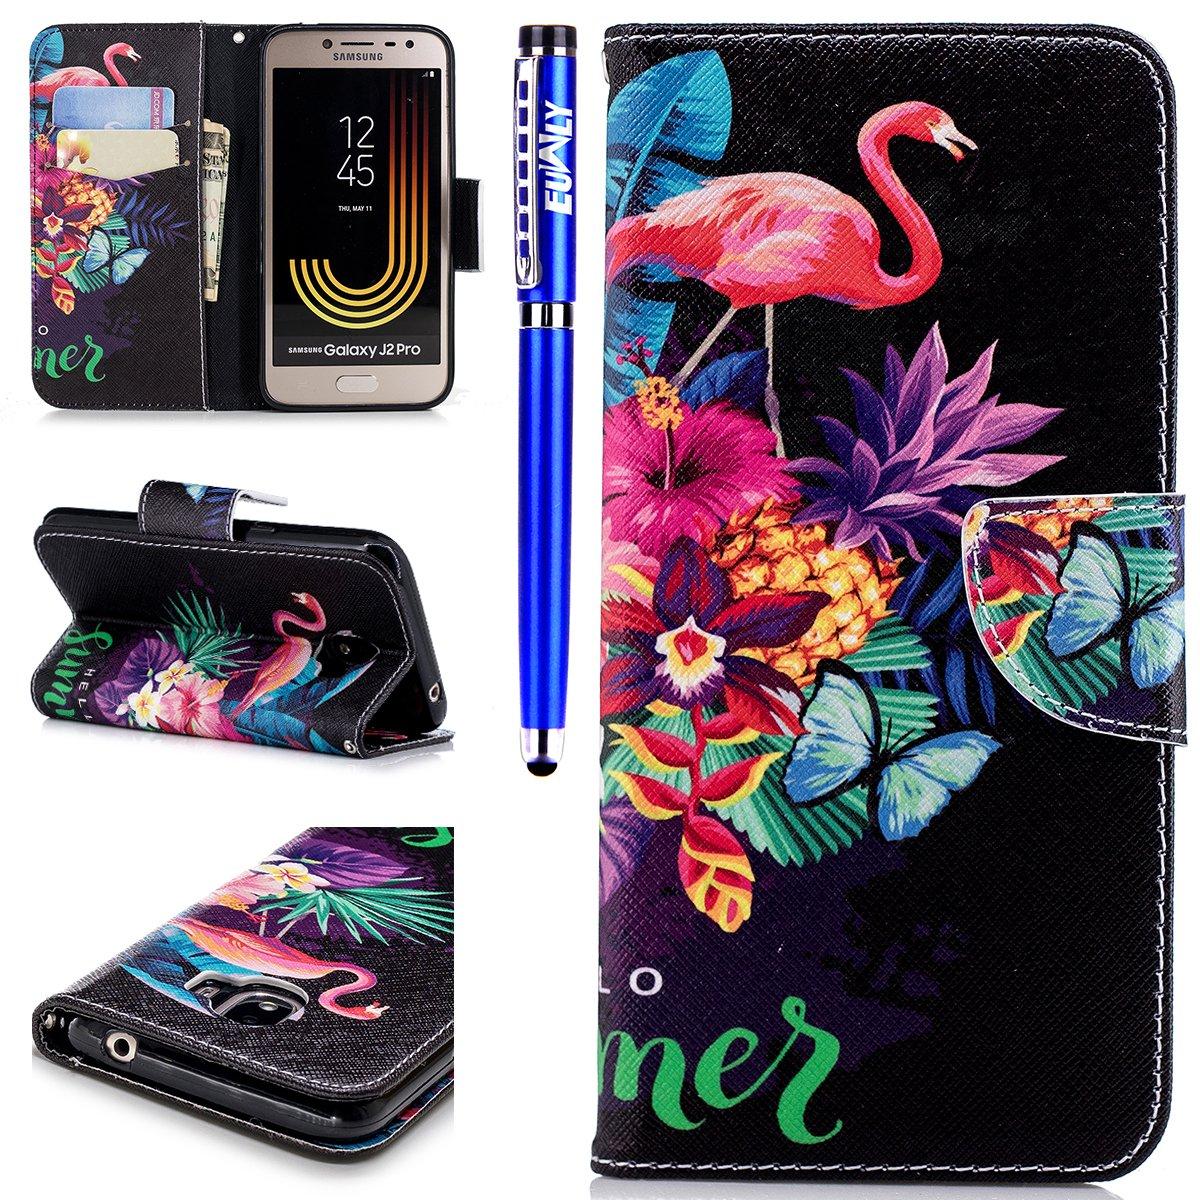 EUWLY Lederhülle Samsung Galaxy J2 Pro 2018 Ledertasche Handytasche Tasche Wallet Hülle im Bookstyle Handyhülle Bunte PU Leder Flip Tasche Case Brieftasche Schutzhülle Kartenfächer,Flamingo Butterfly